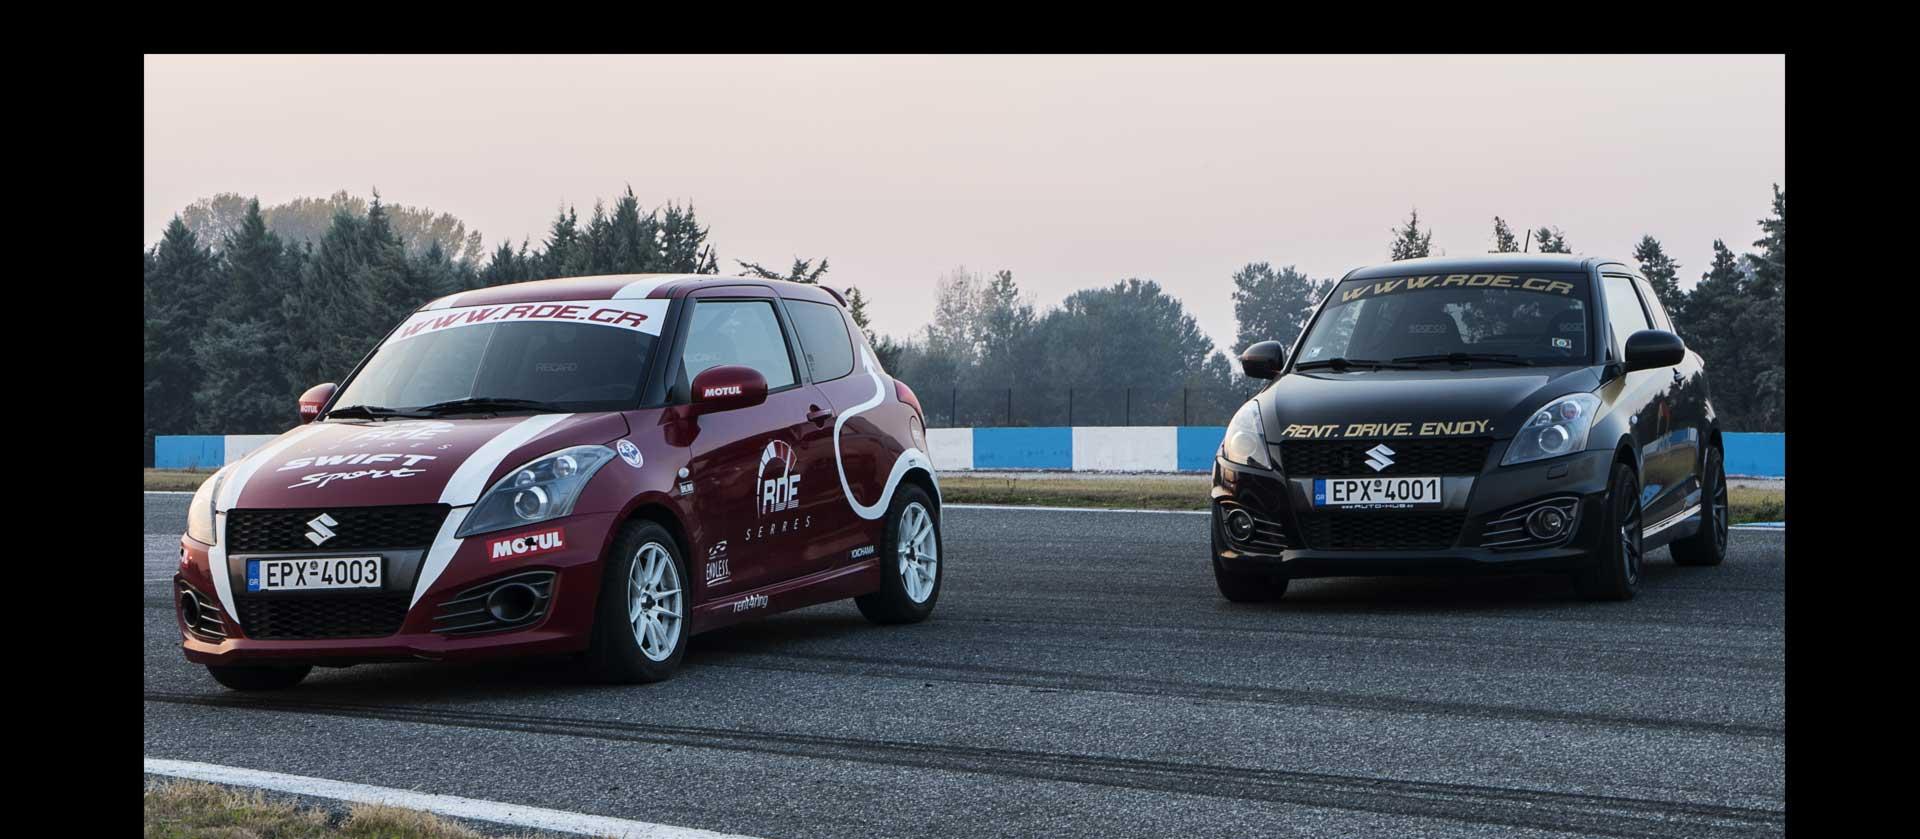 Rent a Race Car in Serres, Greece • RDE • Rent Drive Enjoy